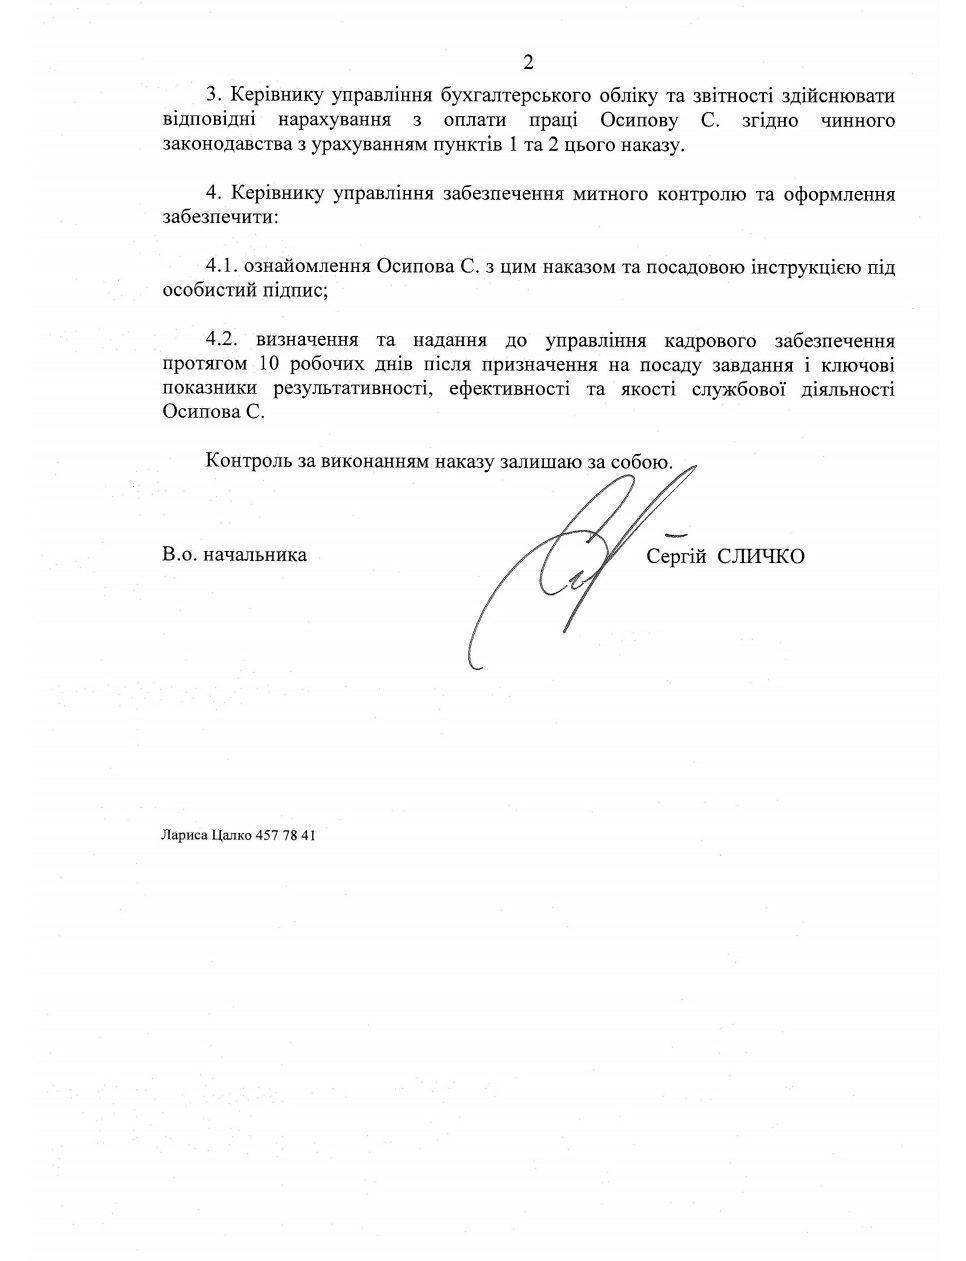 Приказ о назначении Сергея Осипова на таможню